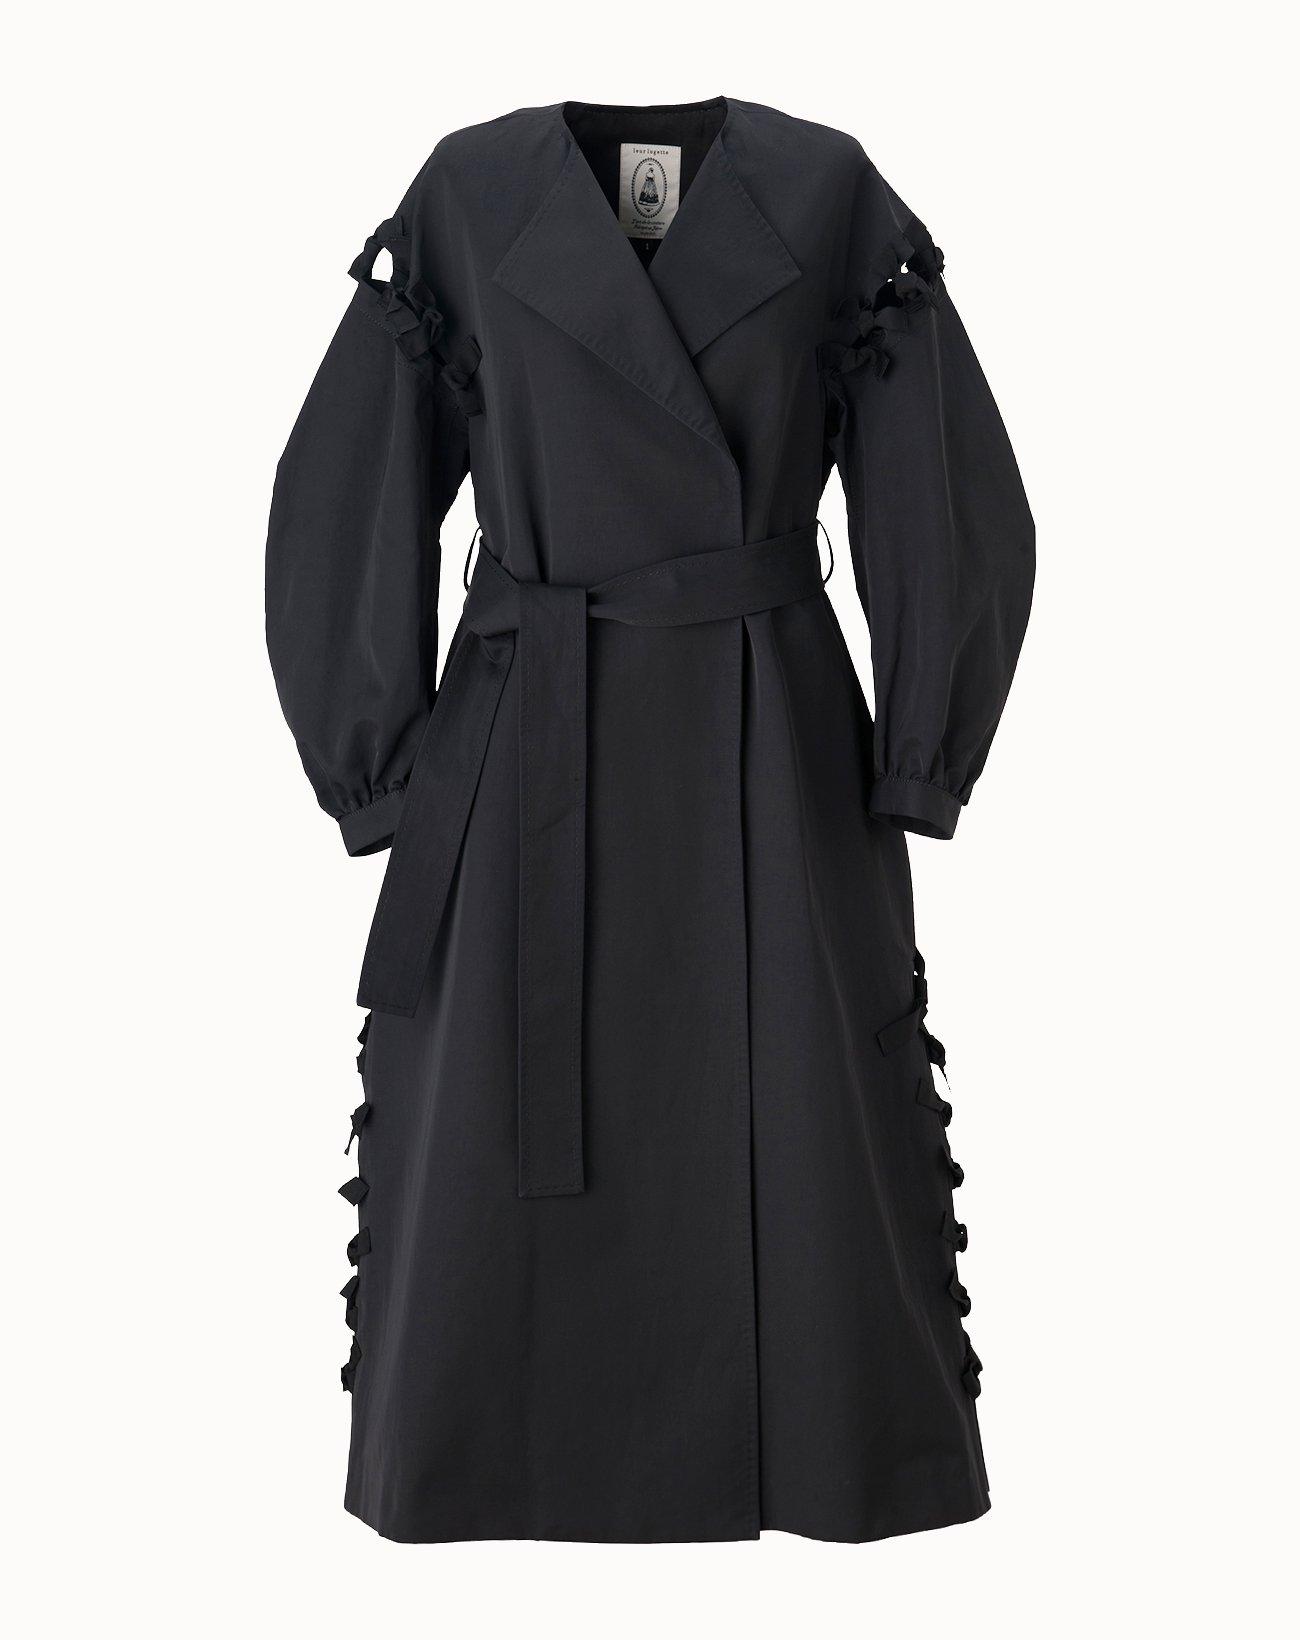 leur logette - Vintage Twill Coat - Black